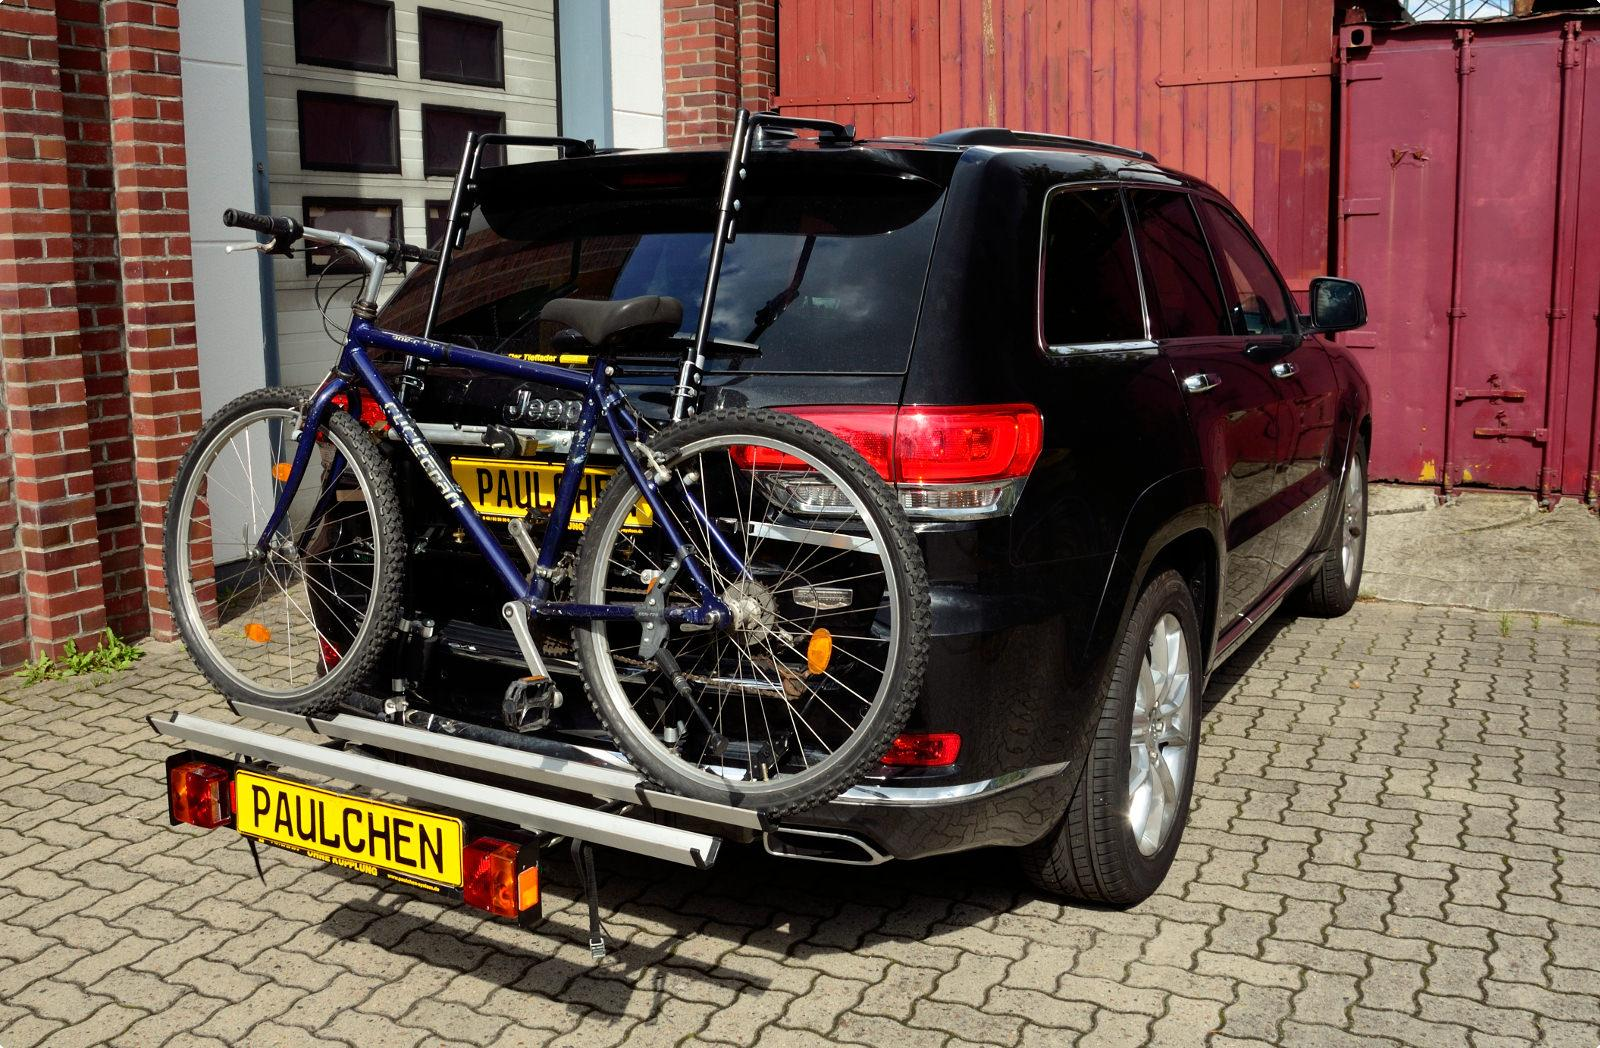 bicycle carrier for chrysler jeep grand cherokee iv facelift wk2 paulchen hecktr ger system. Black Bedroom Furniture Sets. Home Design Ideas